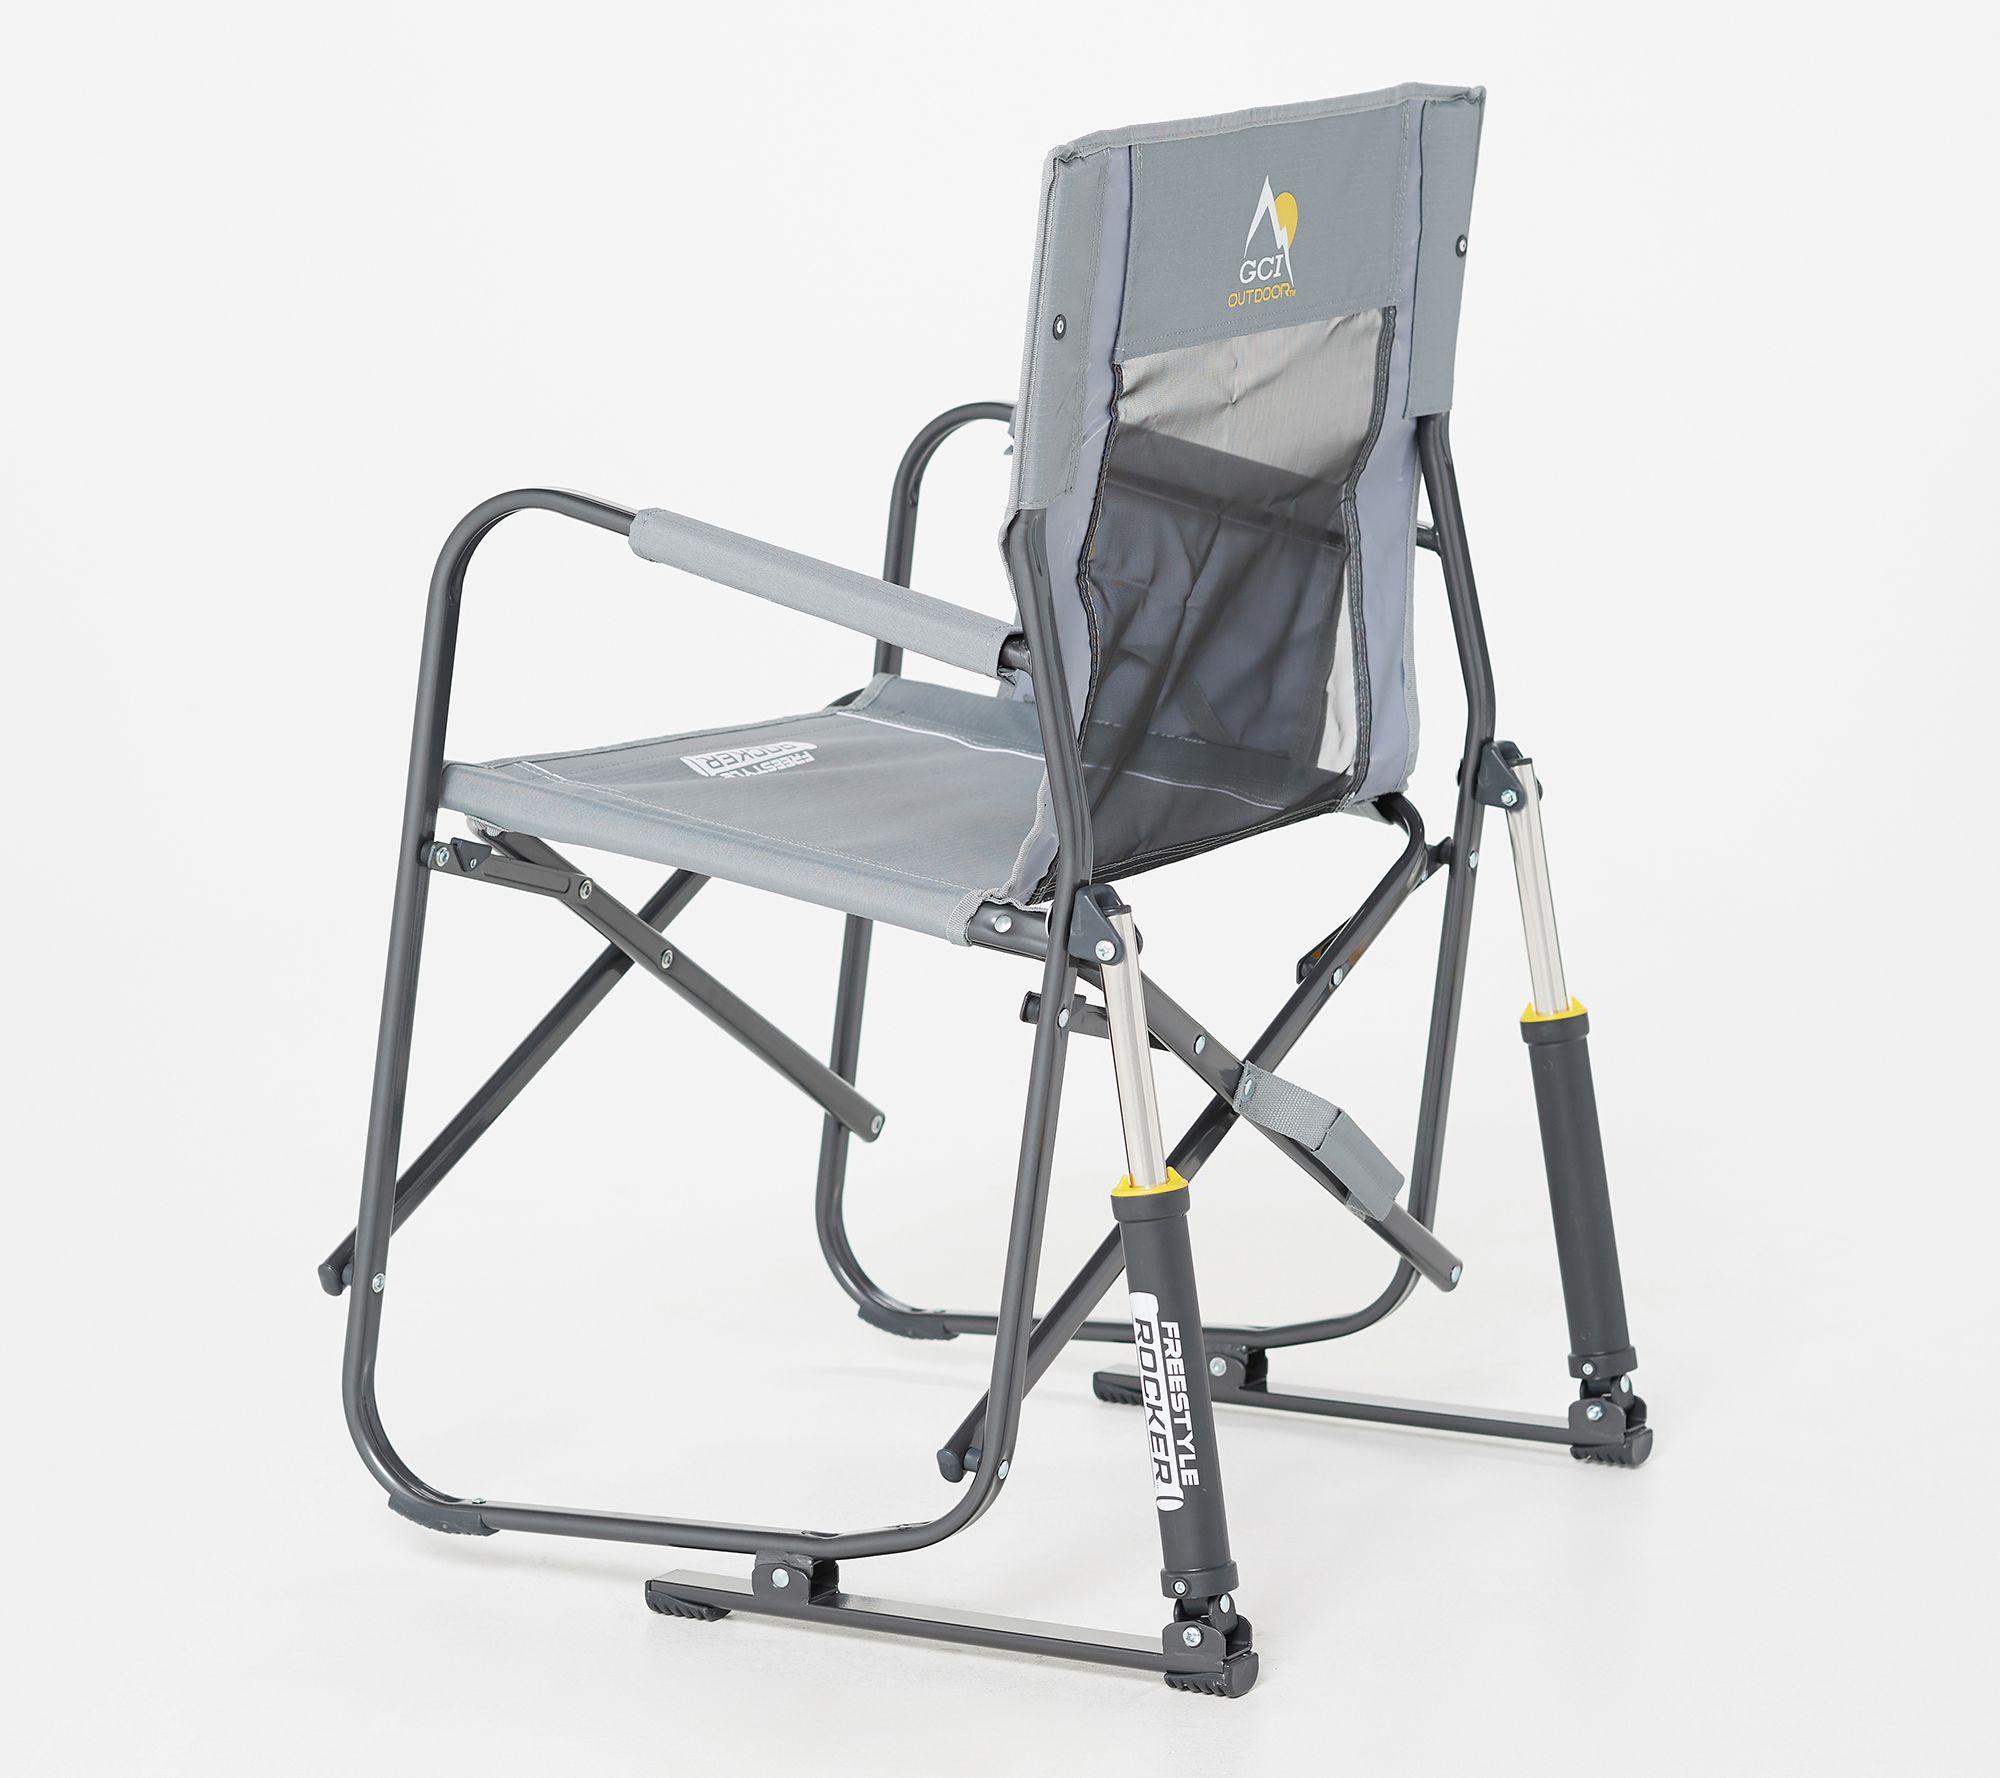 Prime Gci Outdoor Freestyle Pro Rocker Chair With Built In Carry Handle Qvc Com Lamtechconsult Wood Chair Design Ideas Lamtechconsultcom